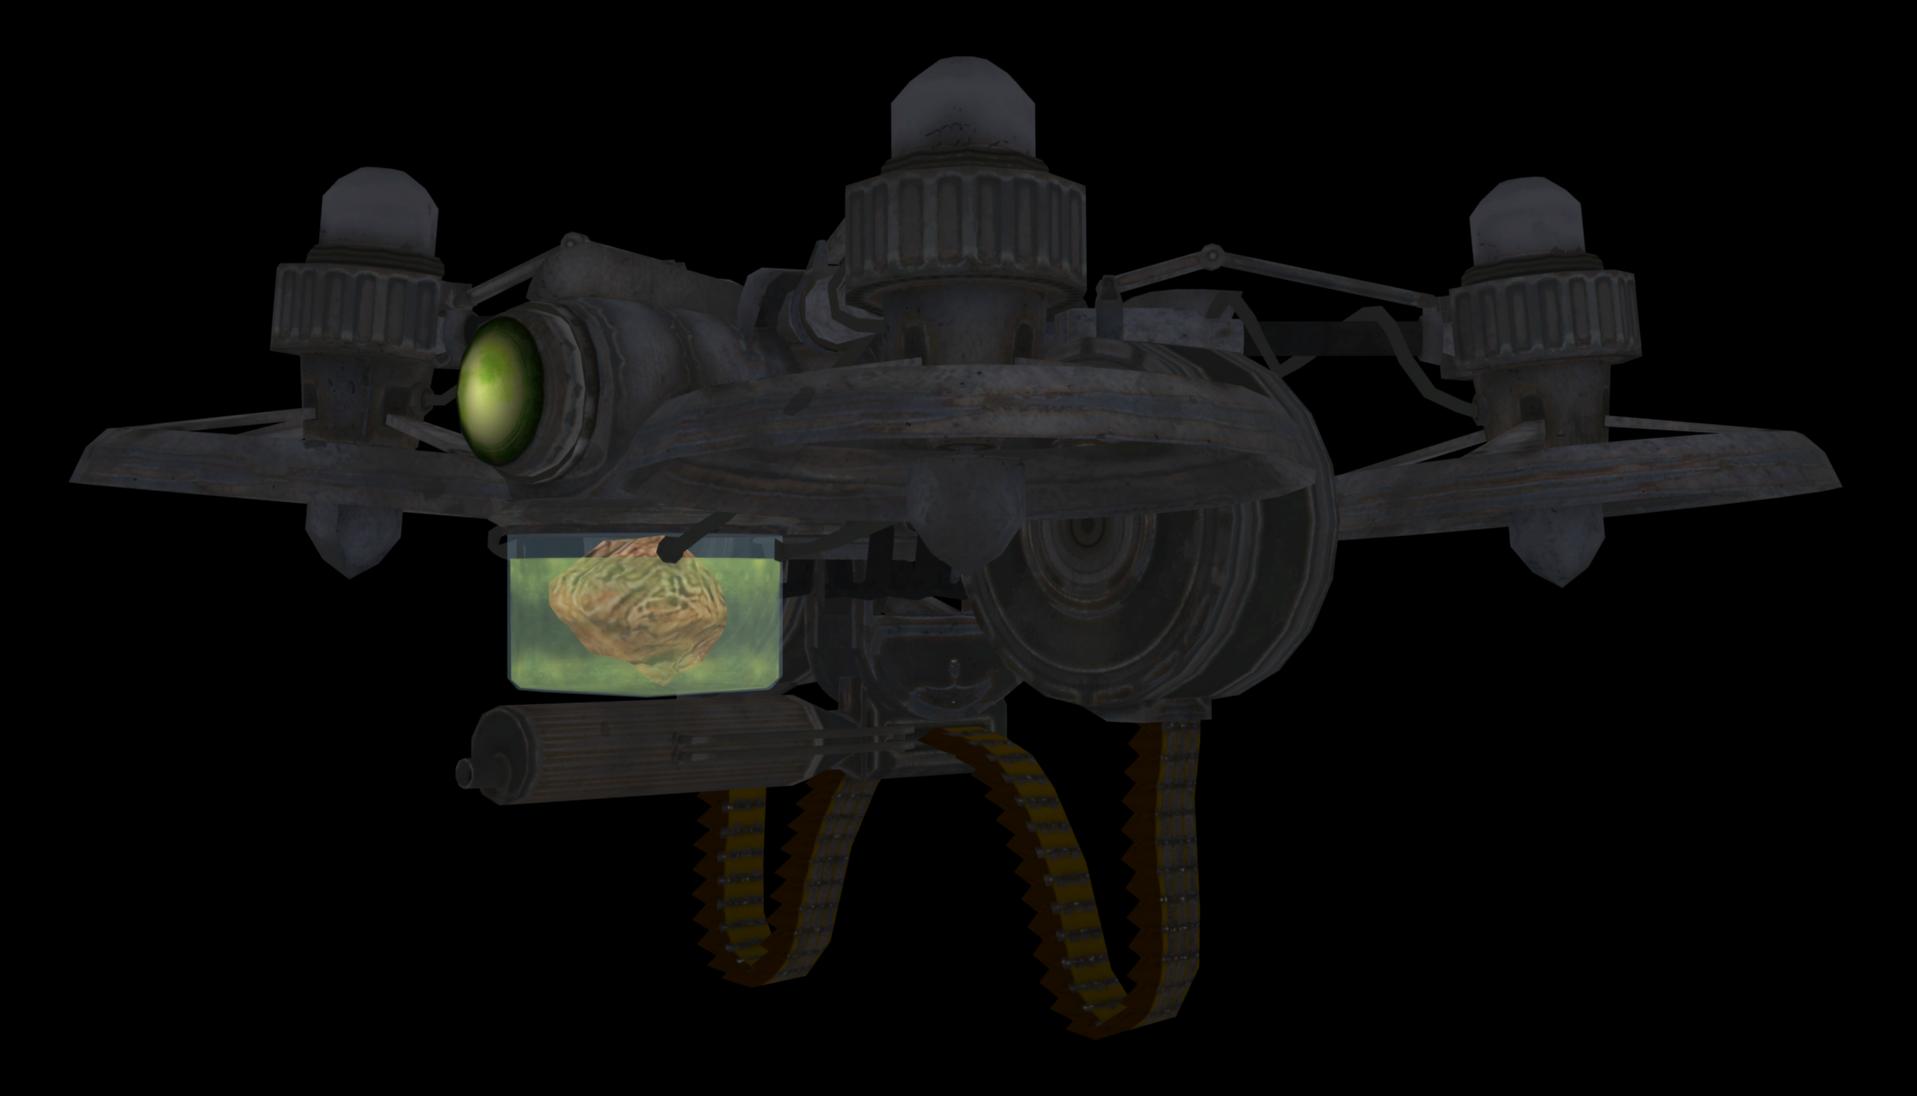 Maxis Drone | Call of Duty Wiki | FANDOM powered by Wikia